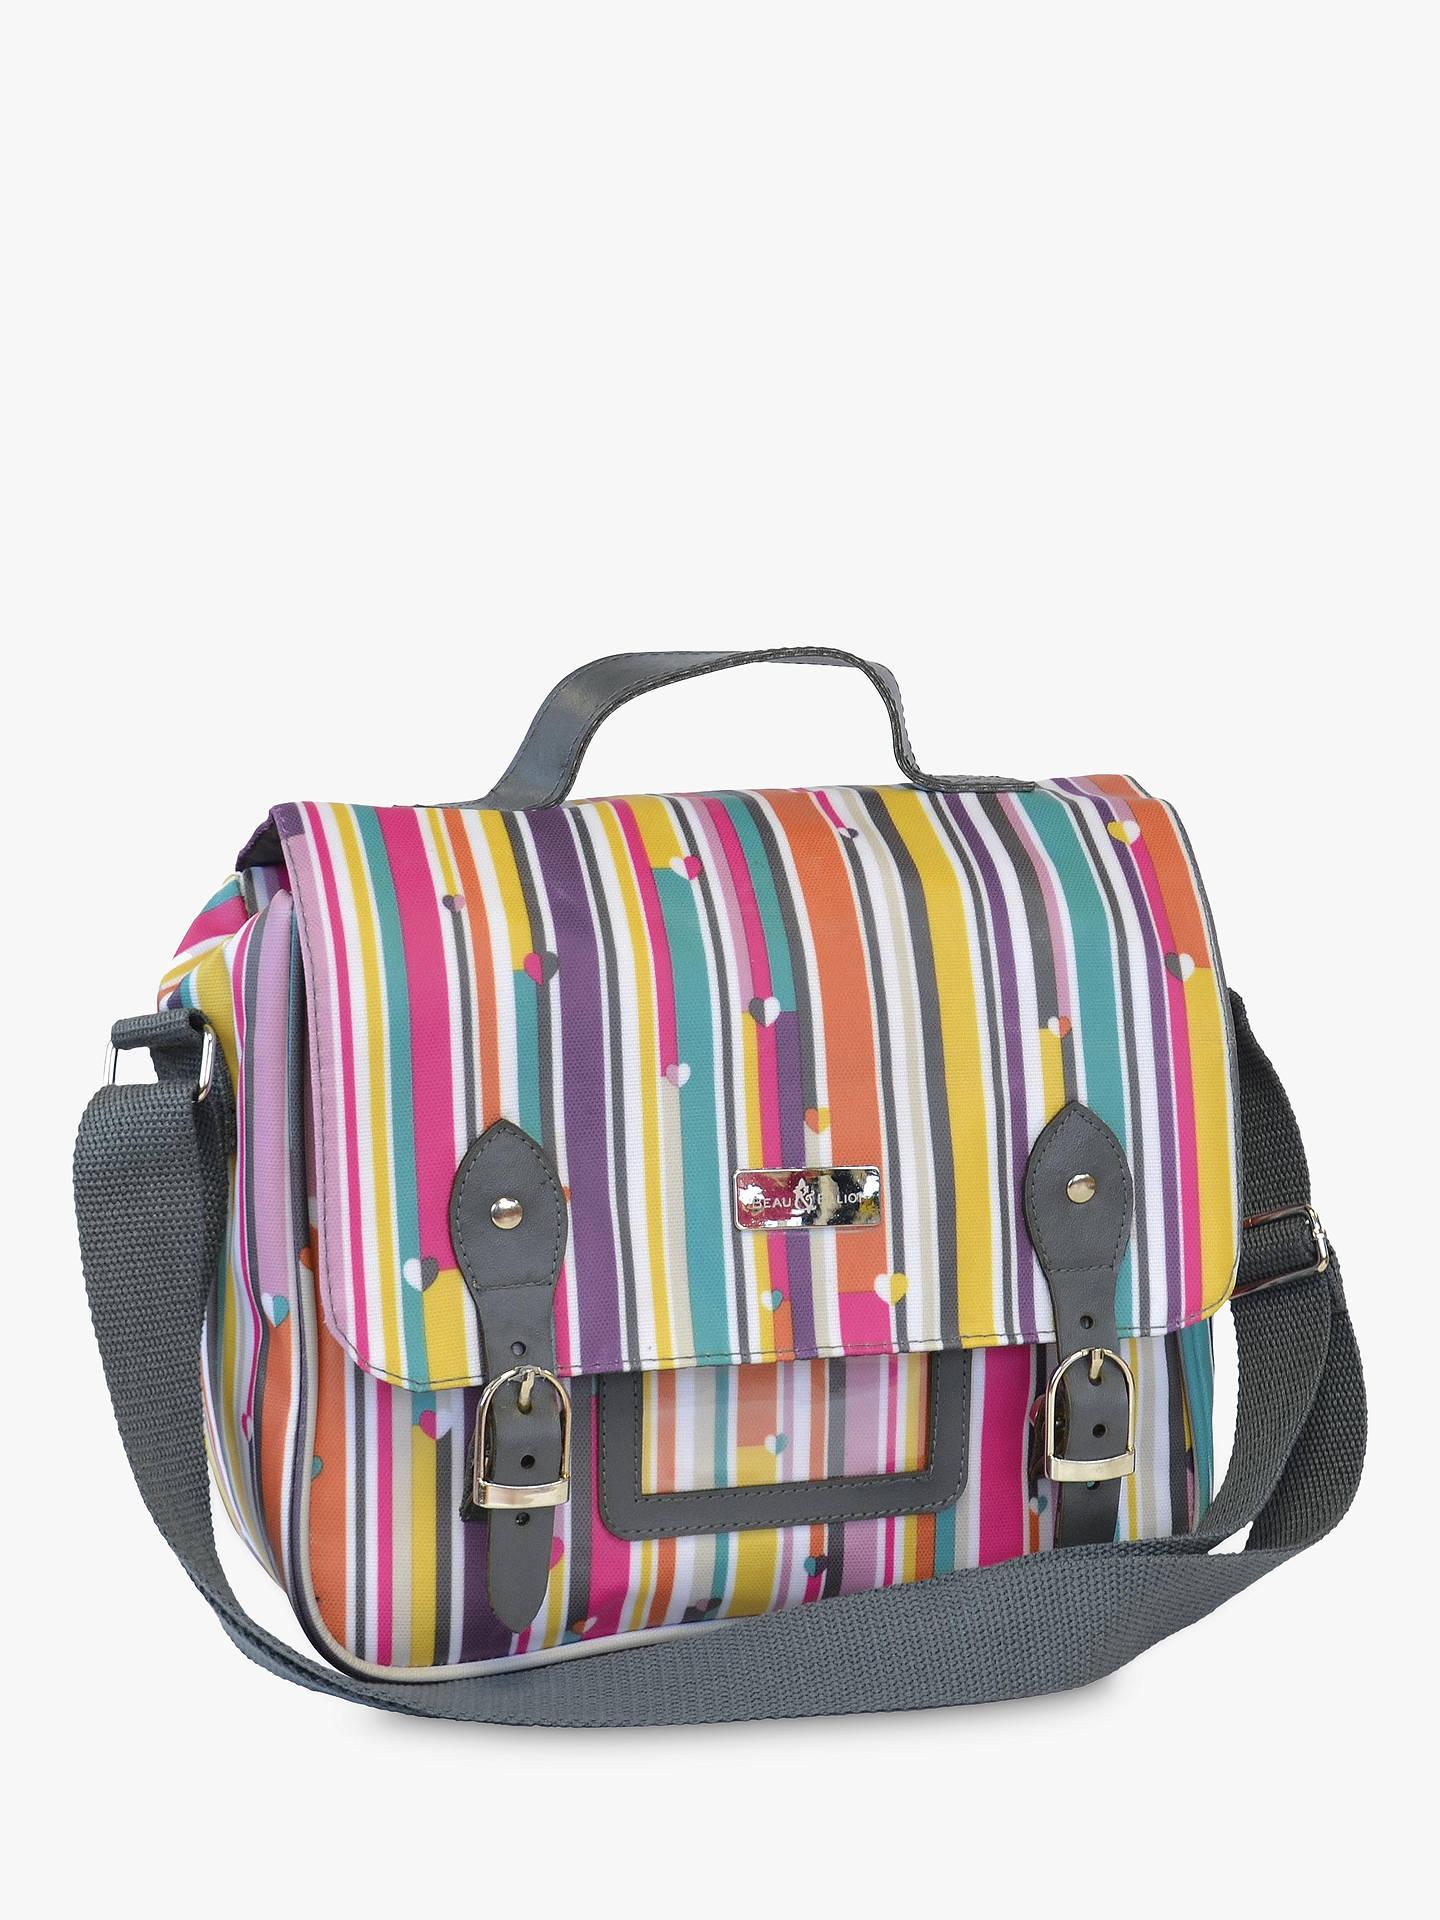 Buy Beau   Elliot Stripe Lunch Satchel and Cooler Bag Online at  johnlewis.com b3860cc770a89